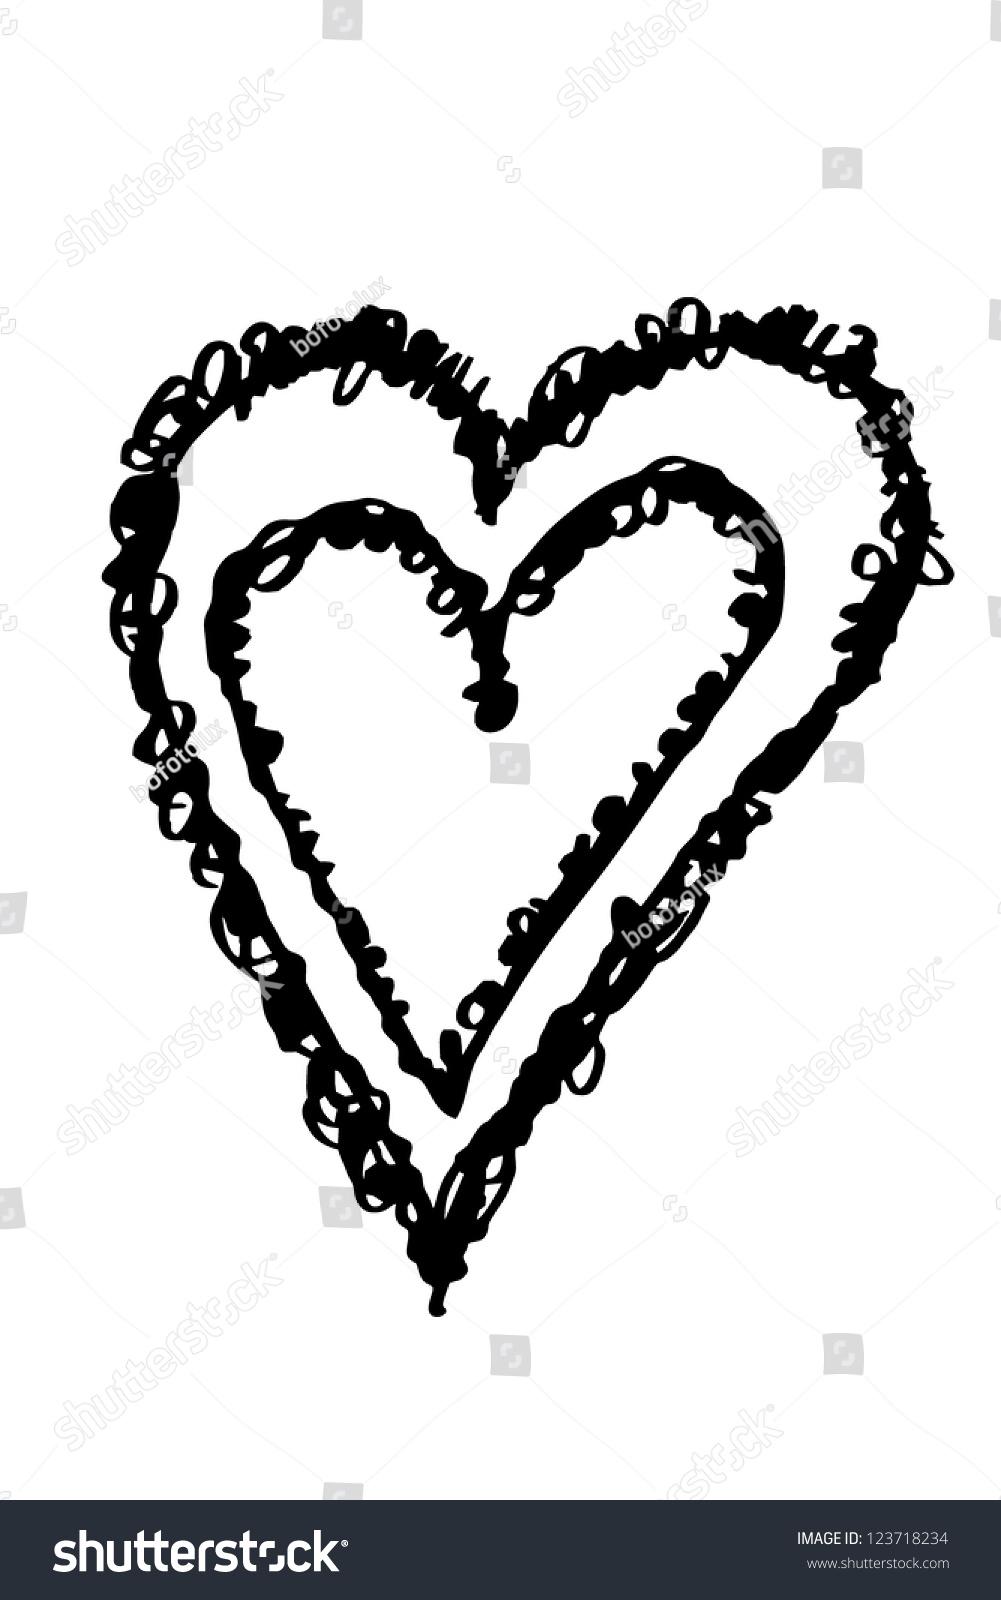 Double Heart Symbol Stock Illustration 123718234 Shutterstock